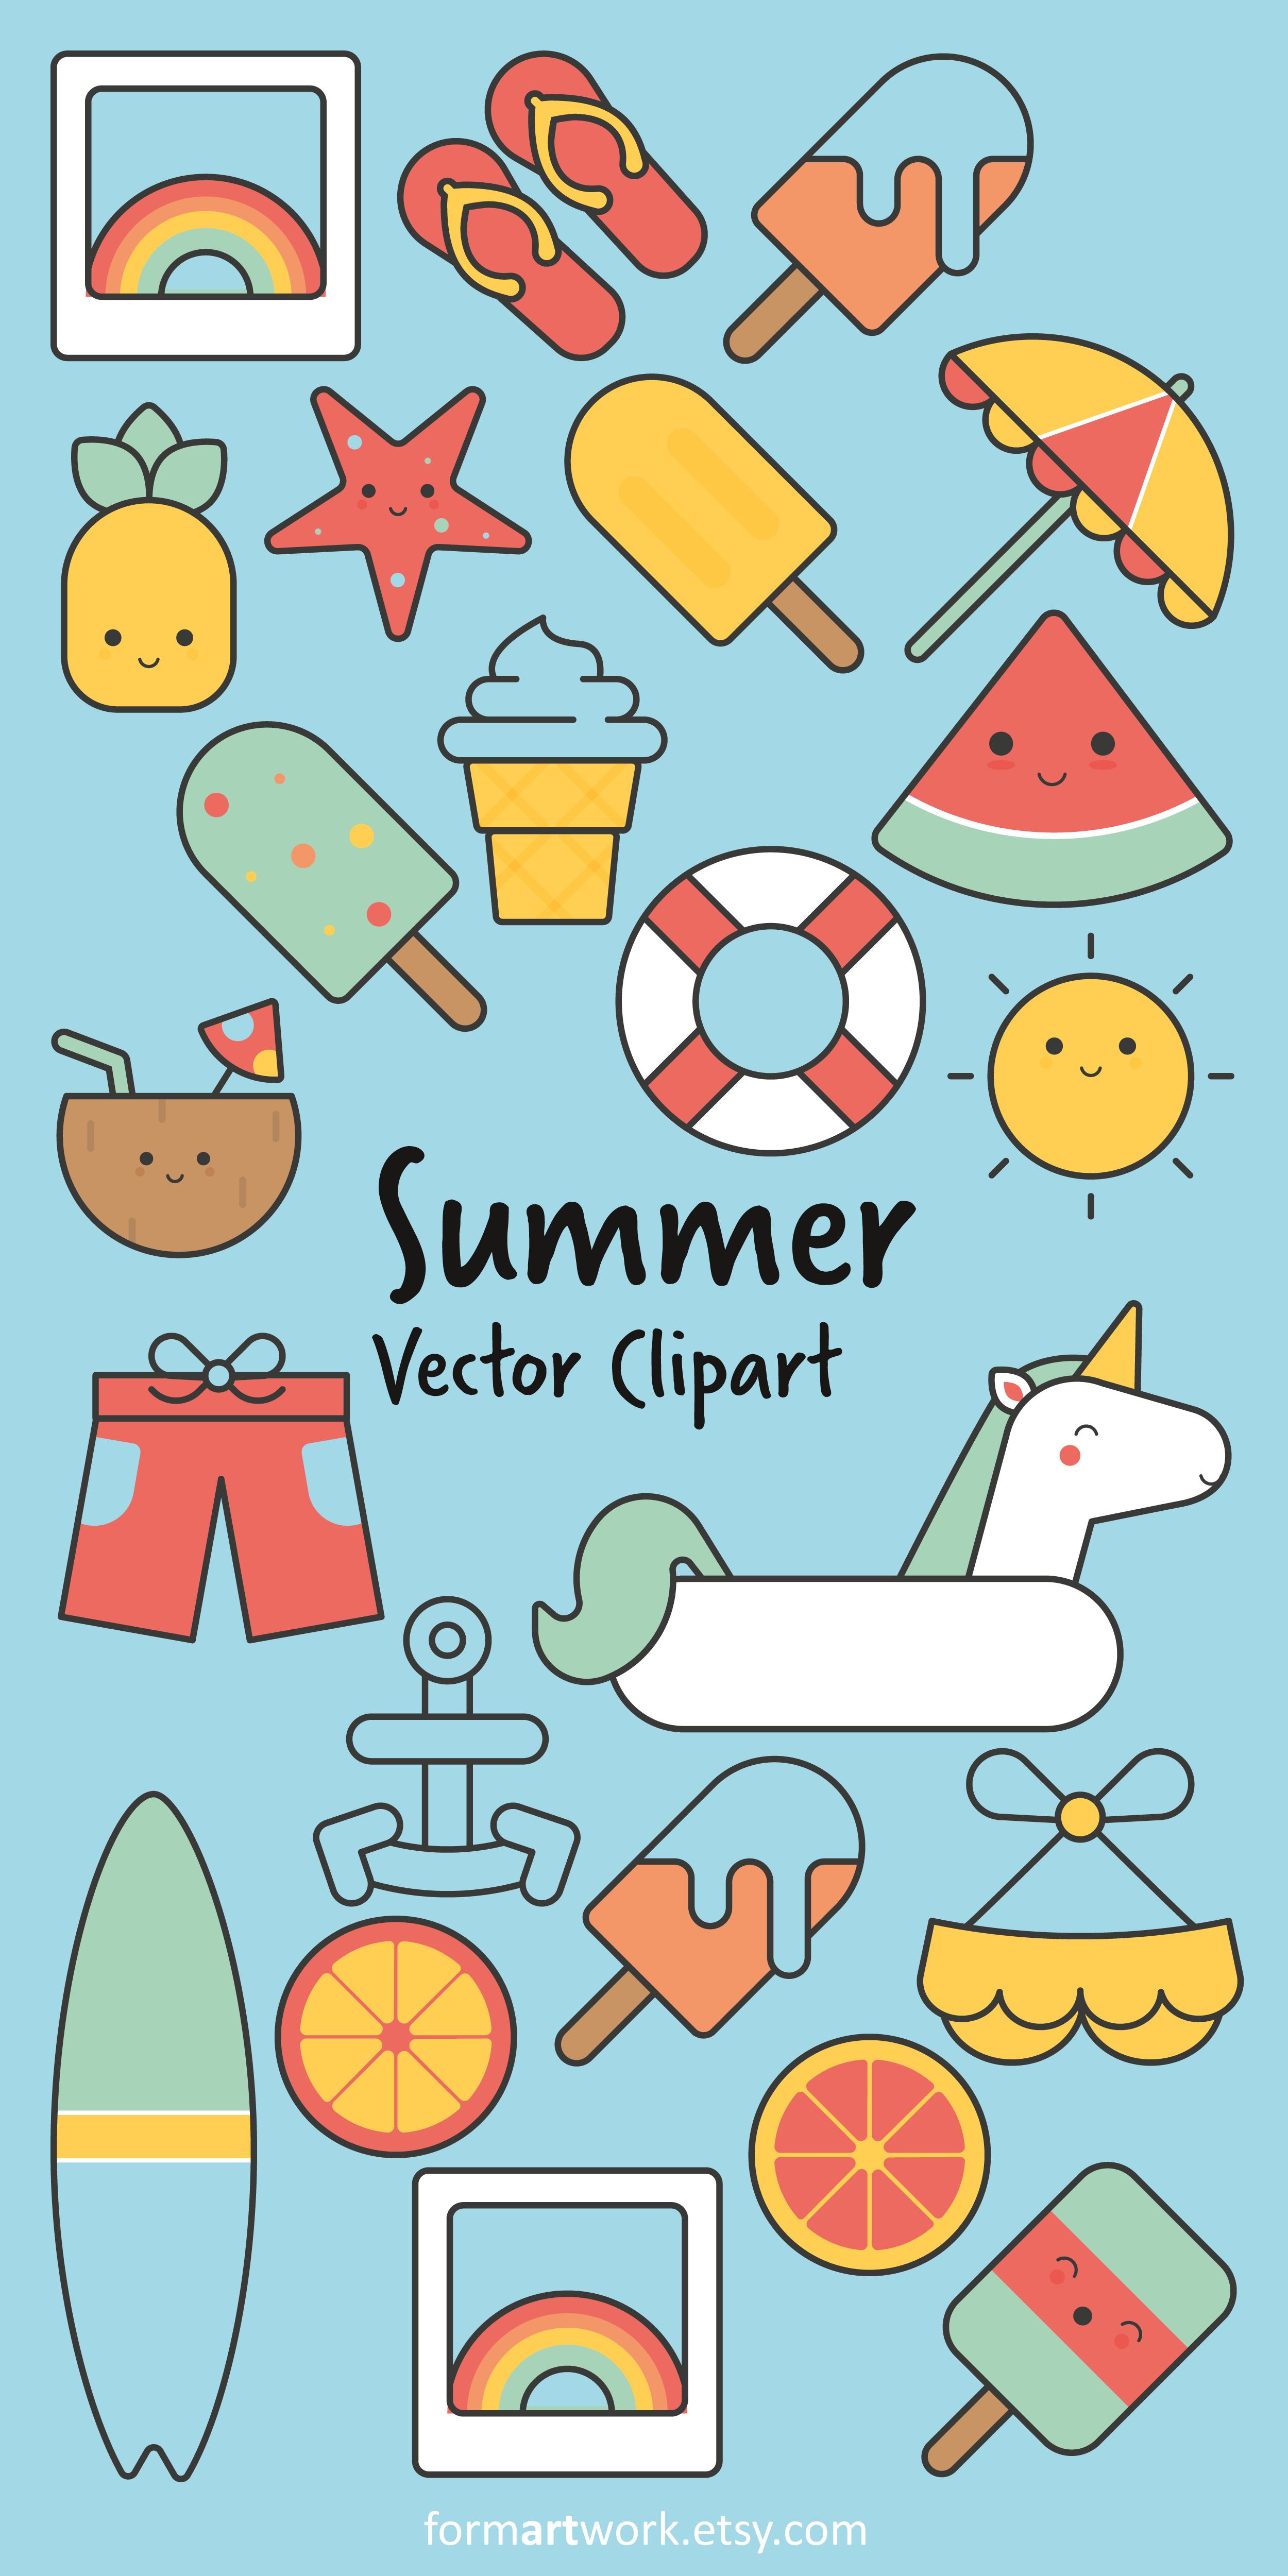 Cute Summer Vector Clipart Set Watermelon Ice Cream Polaroids Bikini Pineapple Coconut Lemon Summer Vector Clip Art Freebies Watermelon Illustration